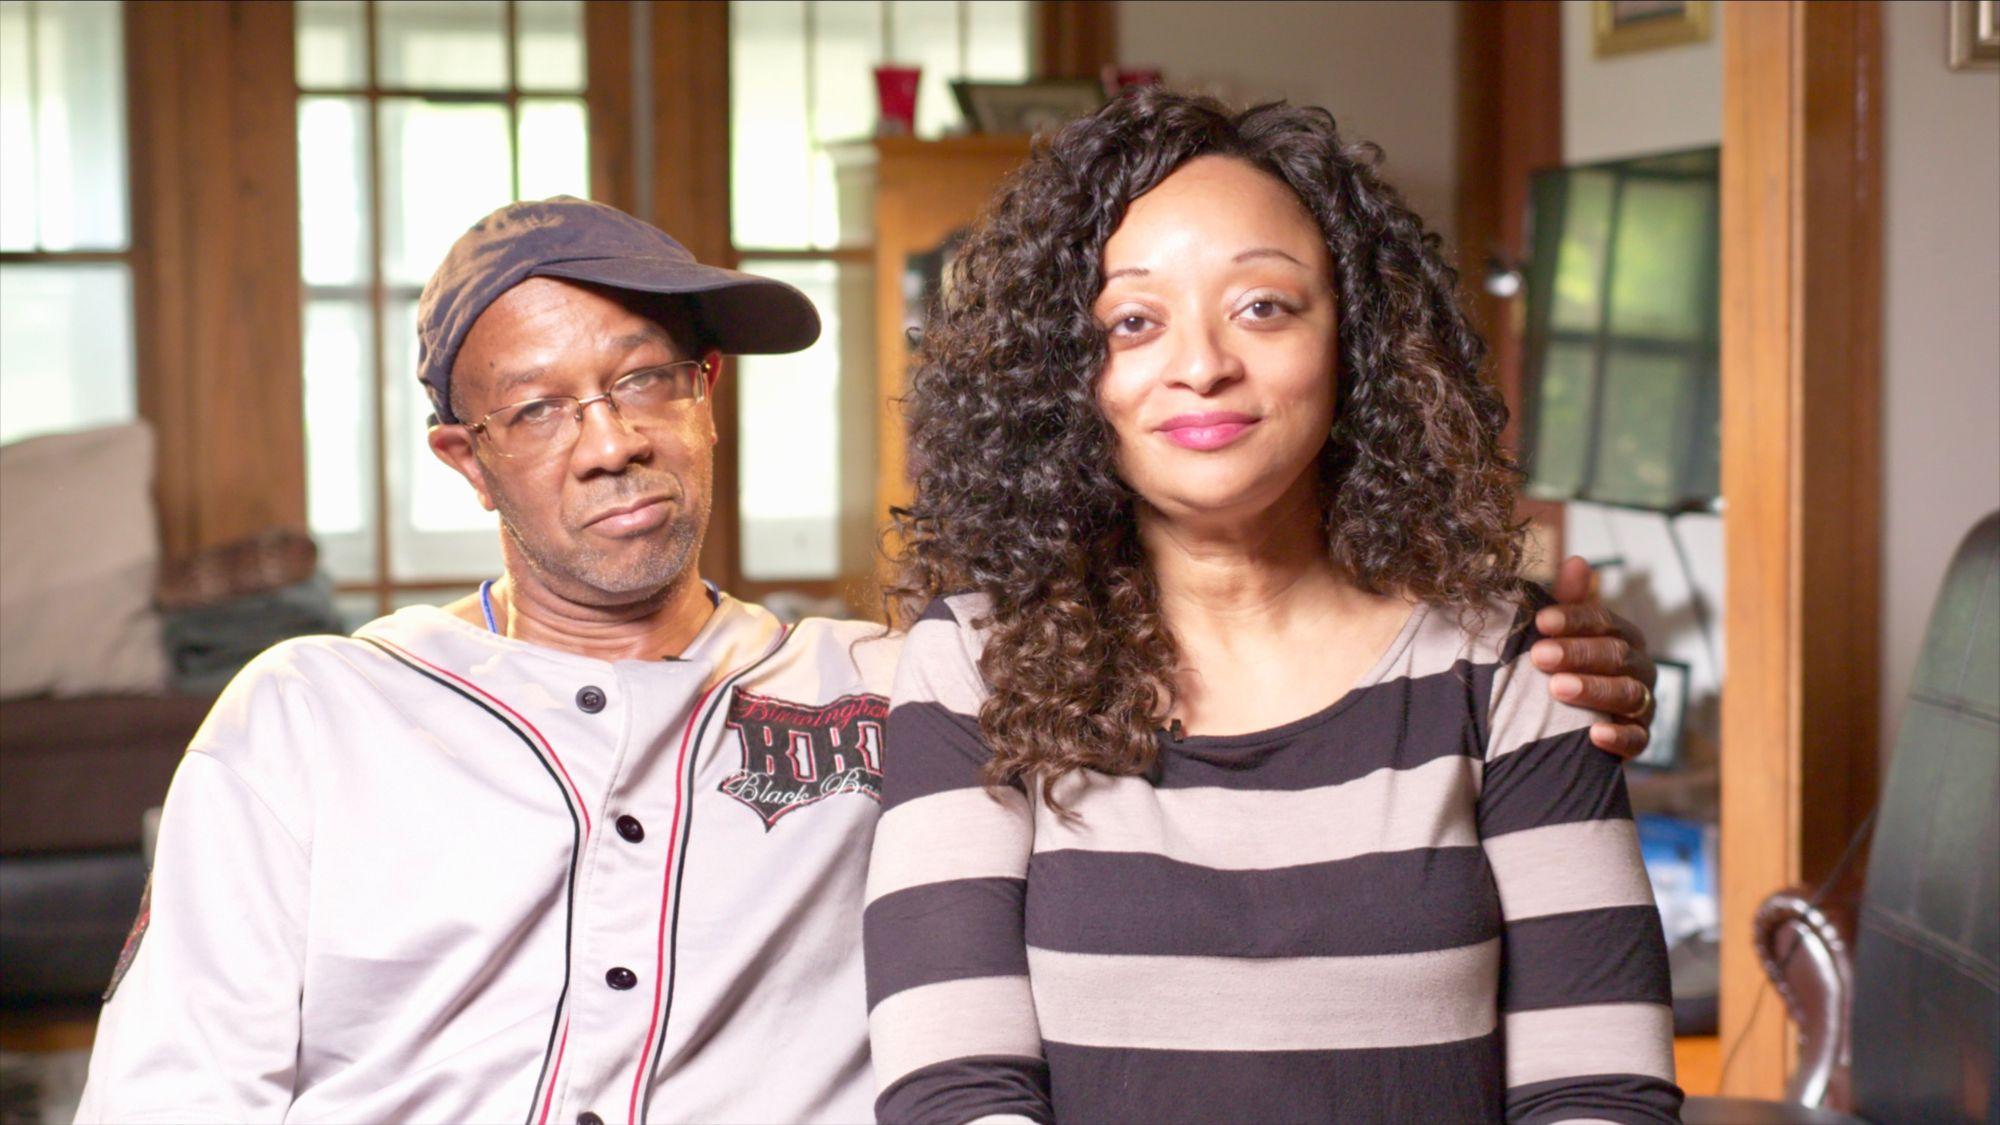 Larry and Lurenza McGhee